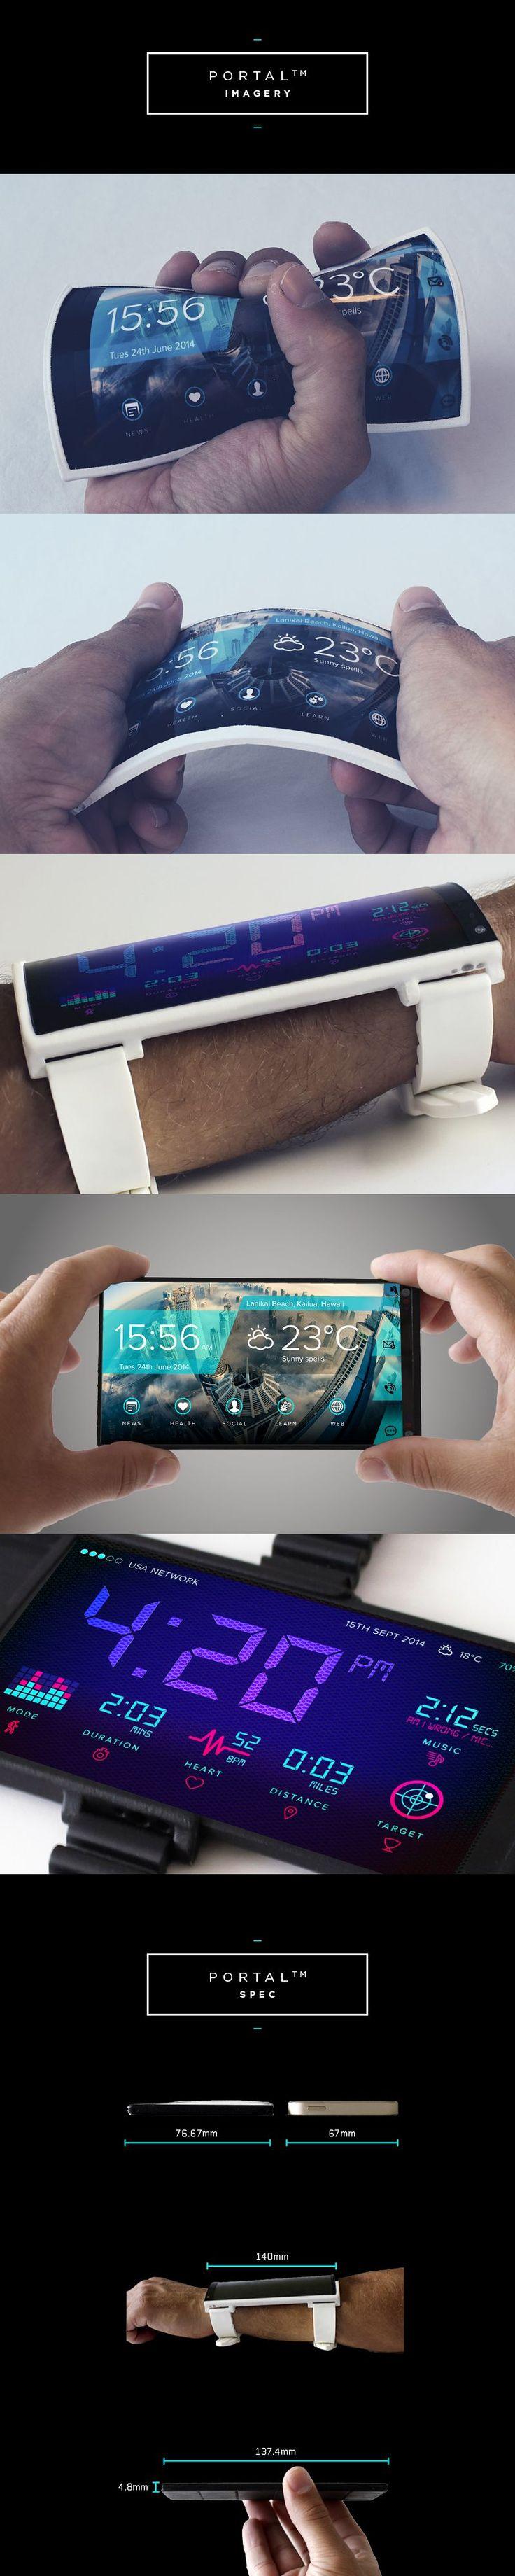 Portal Wearable Smartphone DisruptOverload